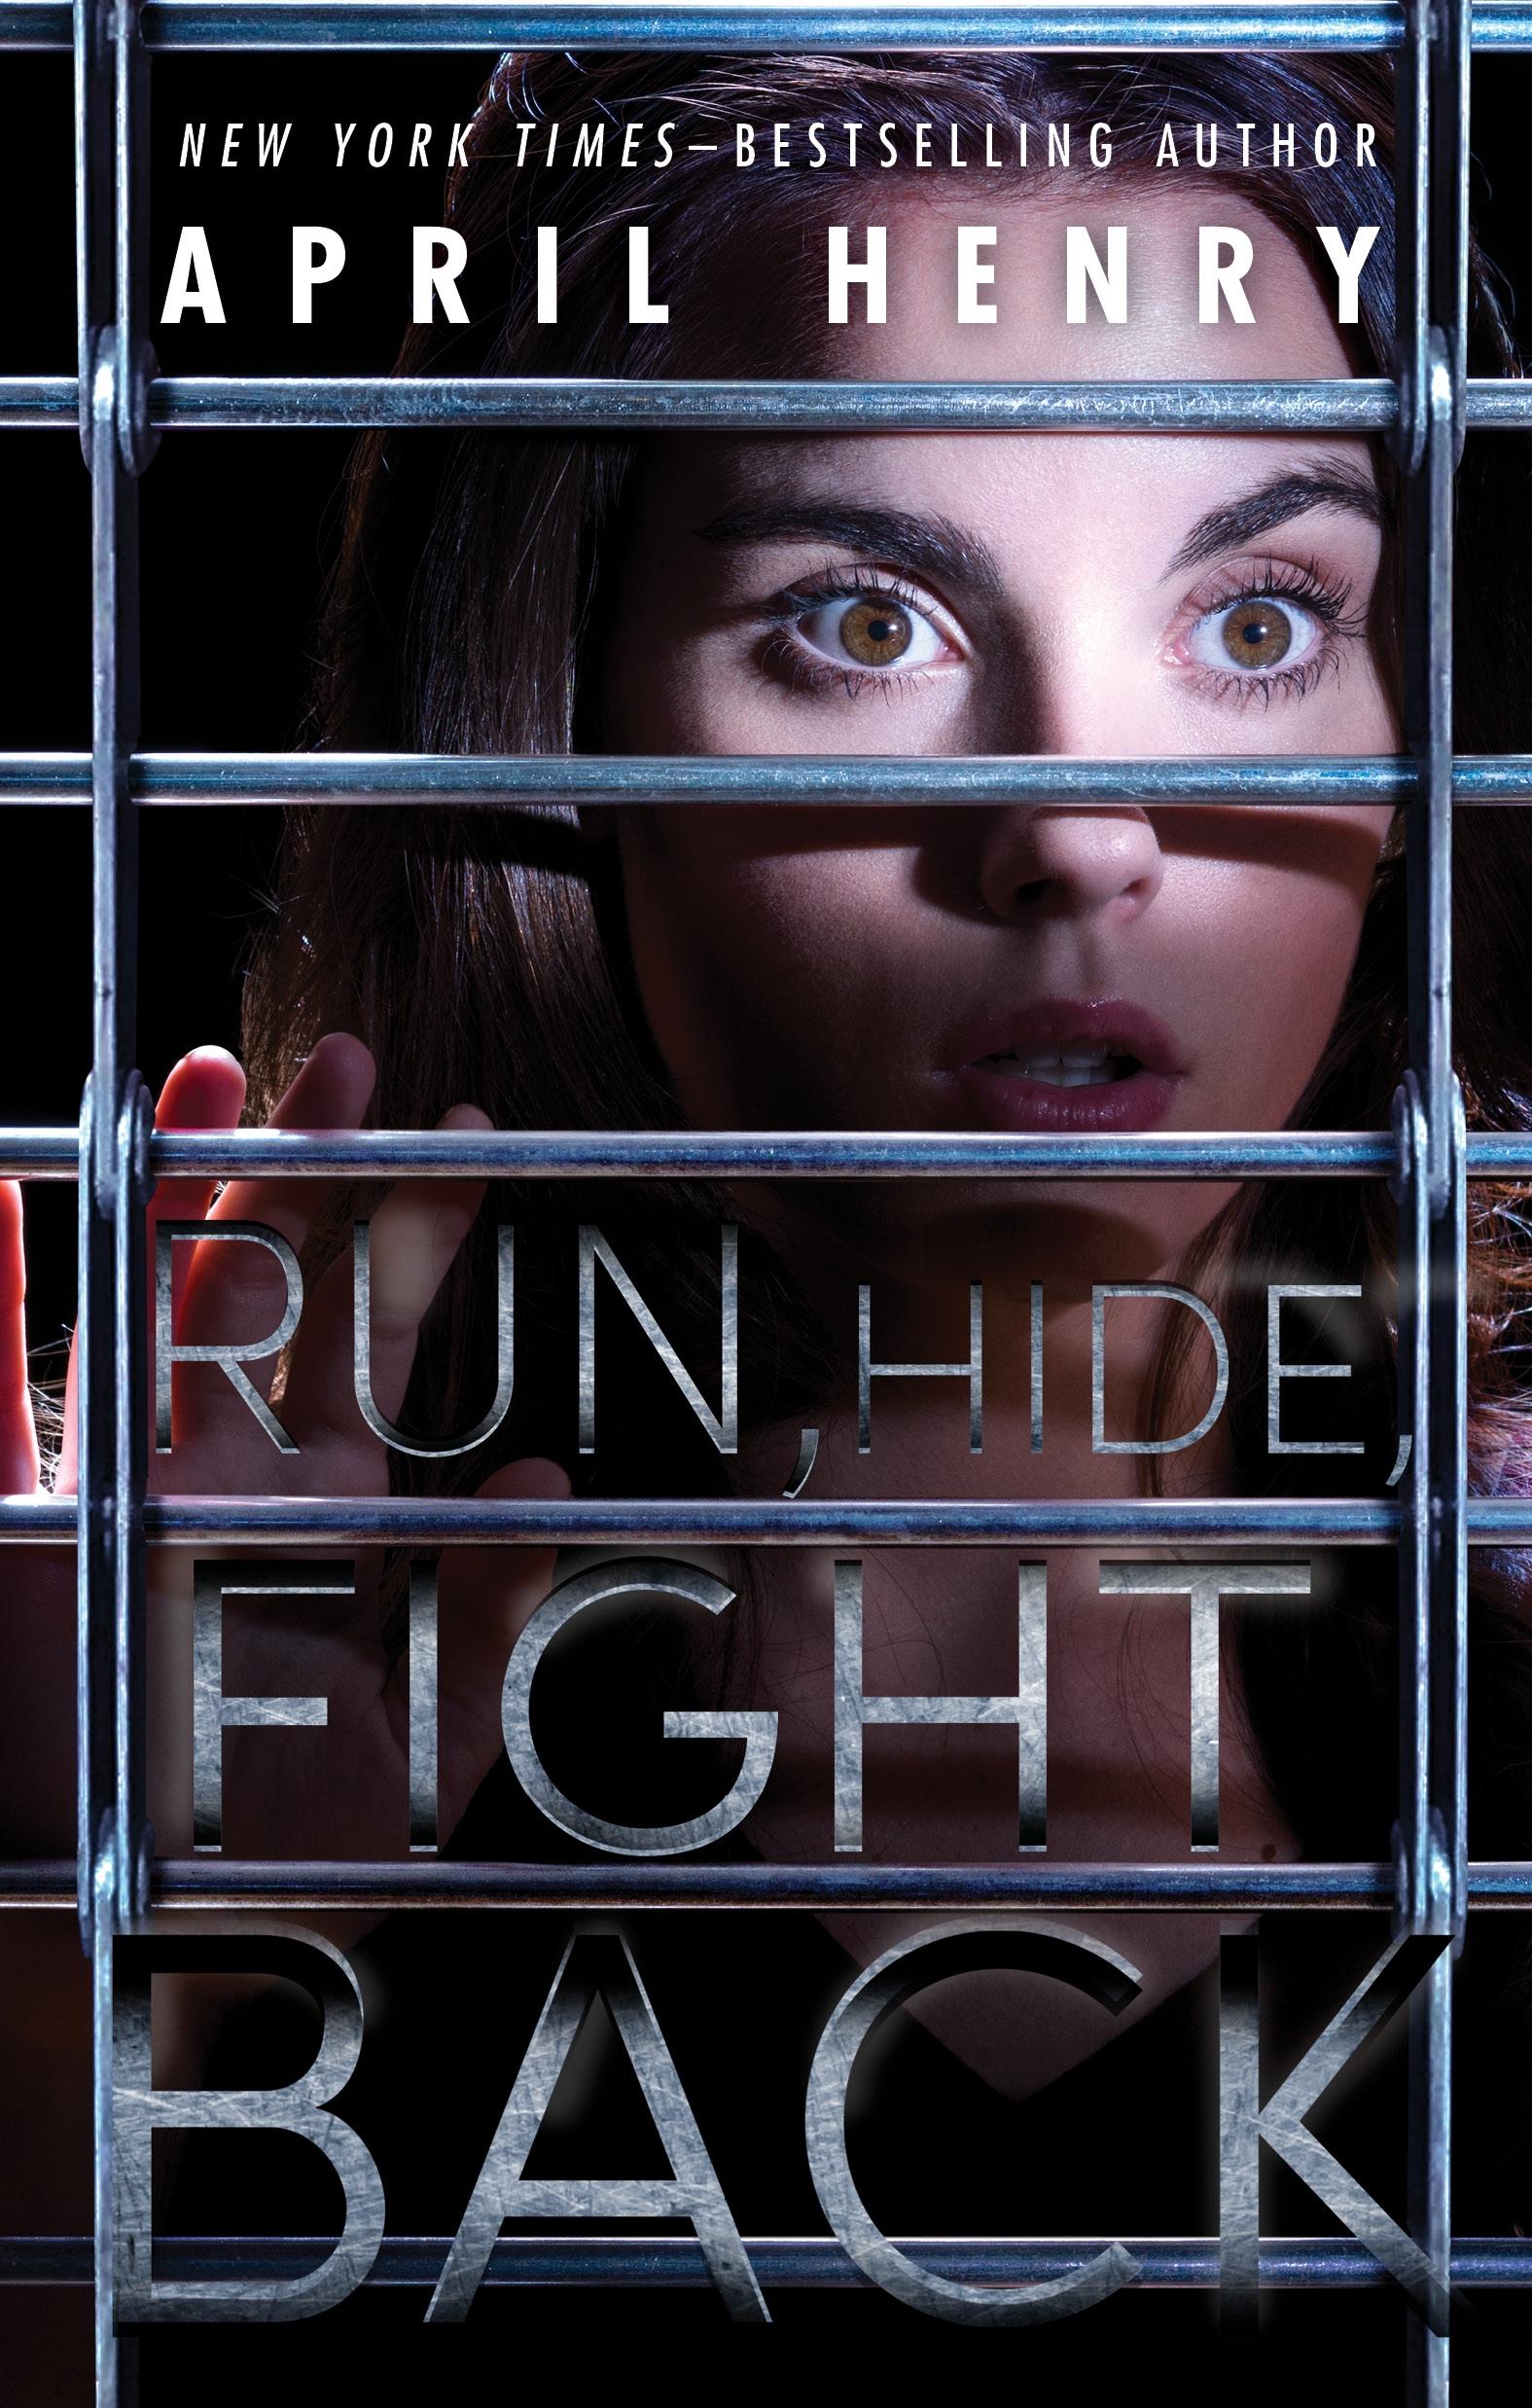 Run, hide, fight back cover image